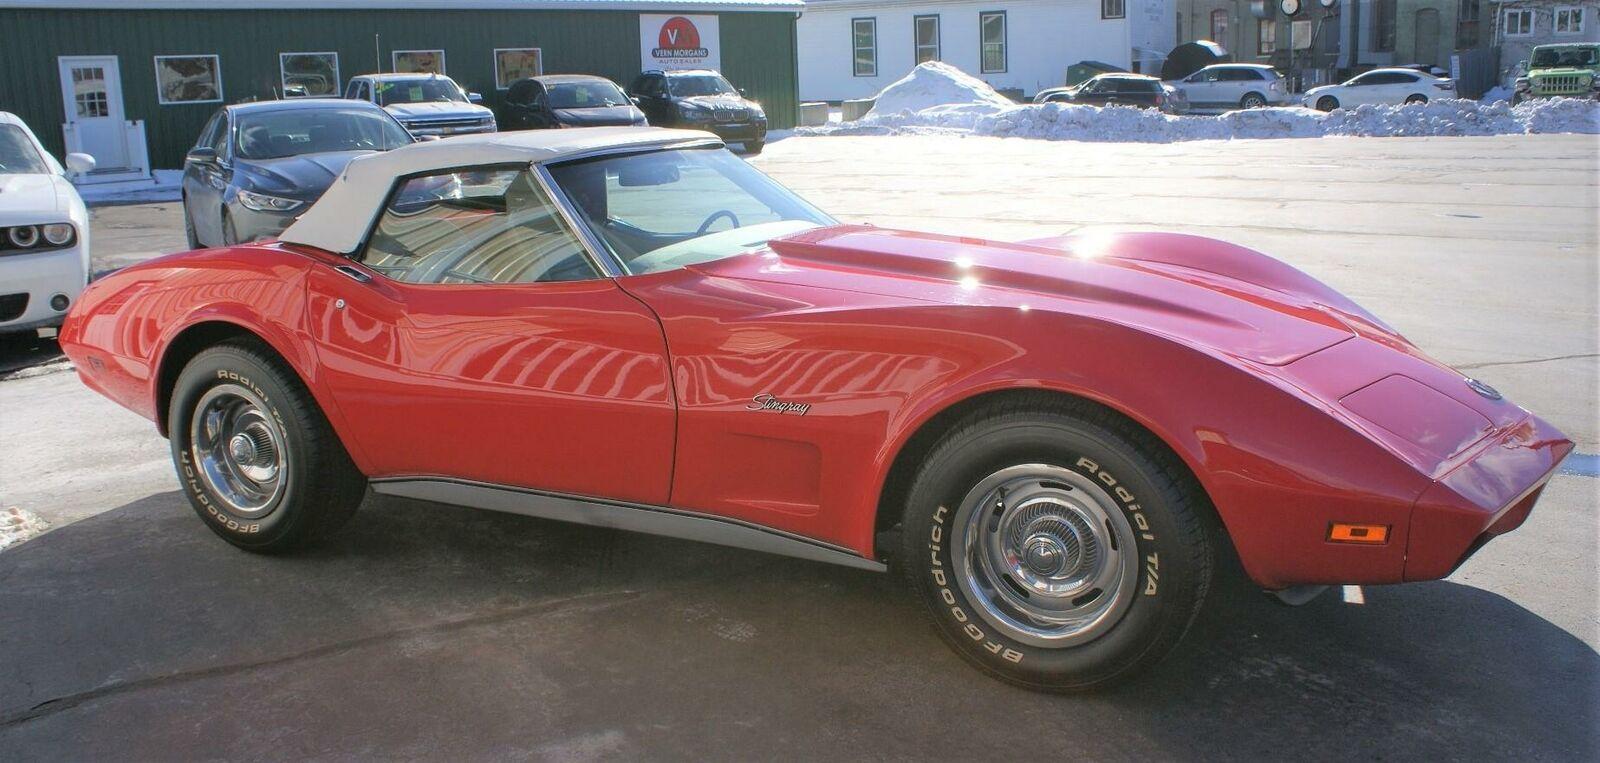 1974 Red Chevrolet Corvette  L82   C3 Corvette Photo 8